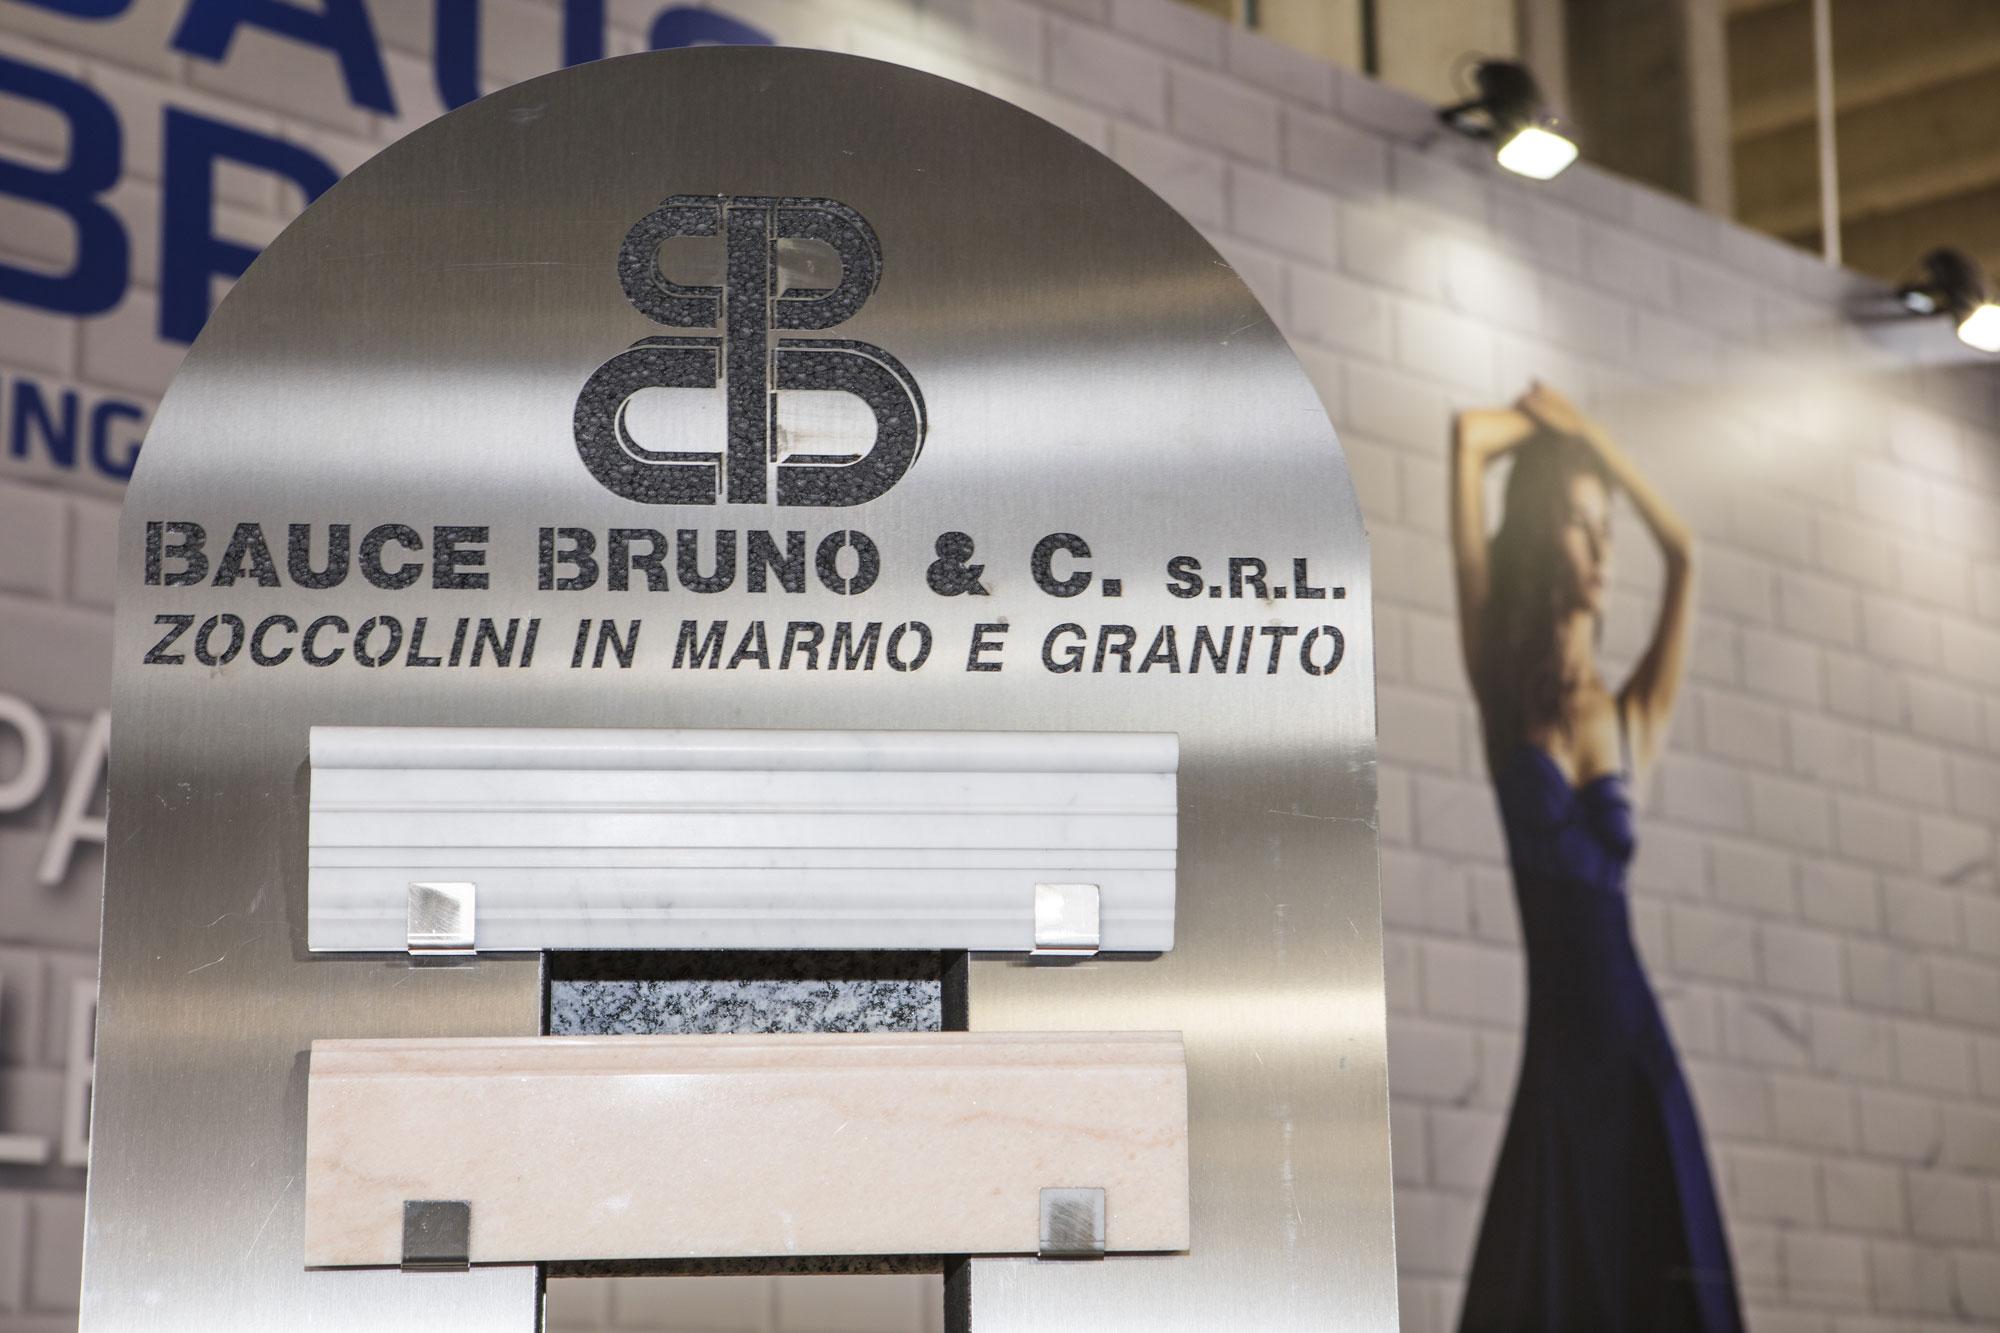 Bauce bruno - Marmomac 2016